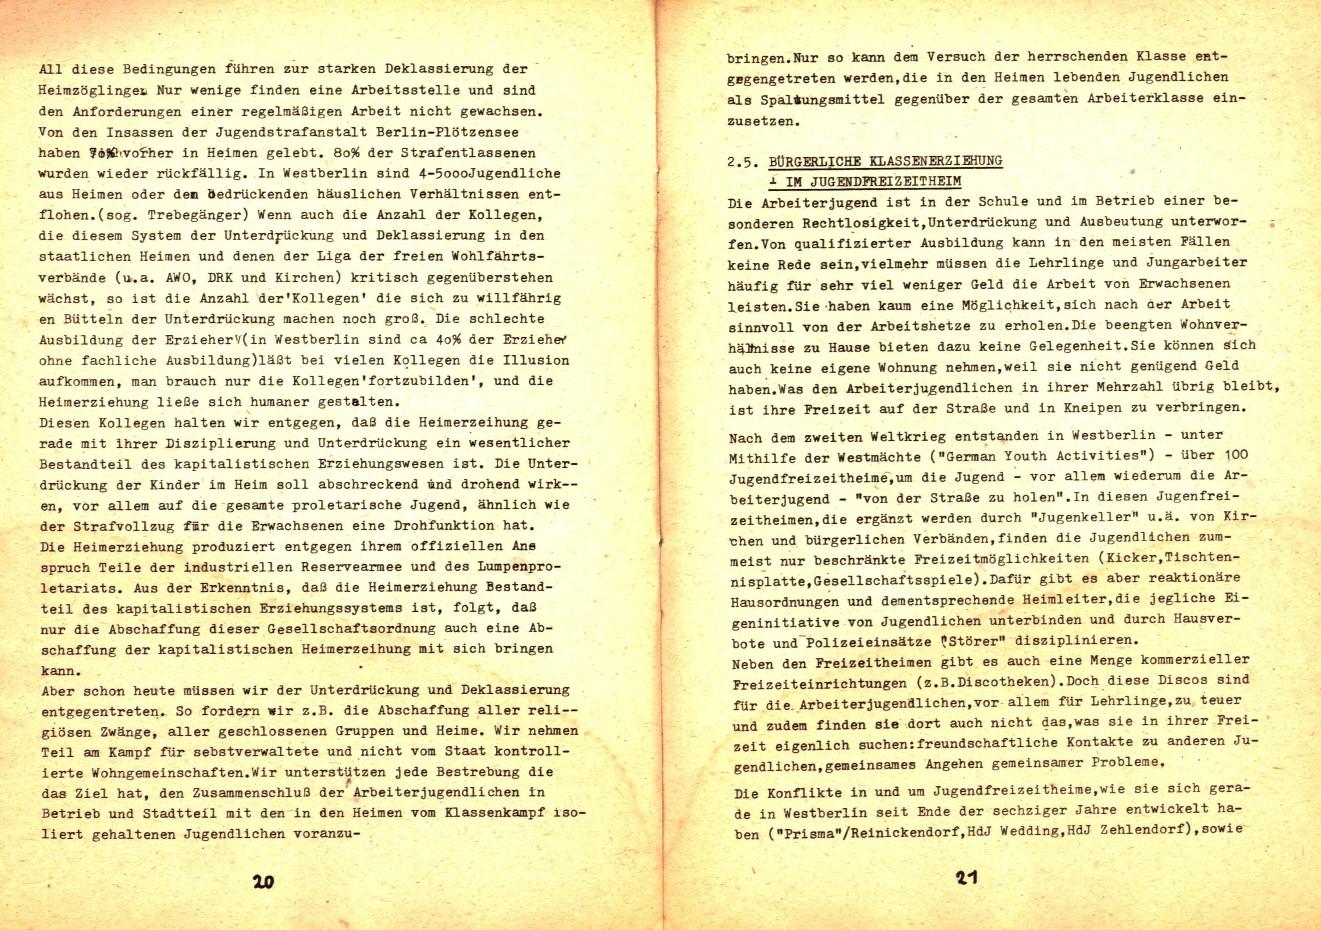 Berlin_BSLE_1975_Grundlagenpapier_12